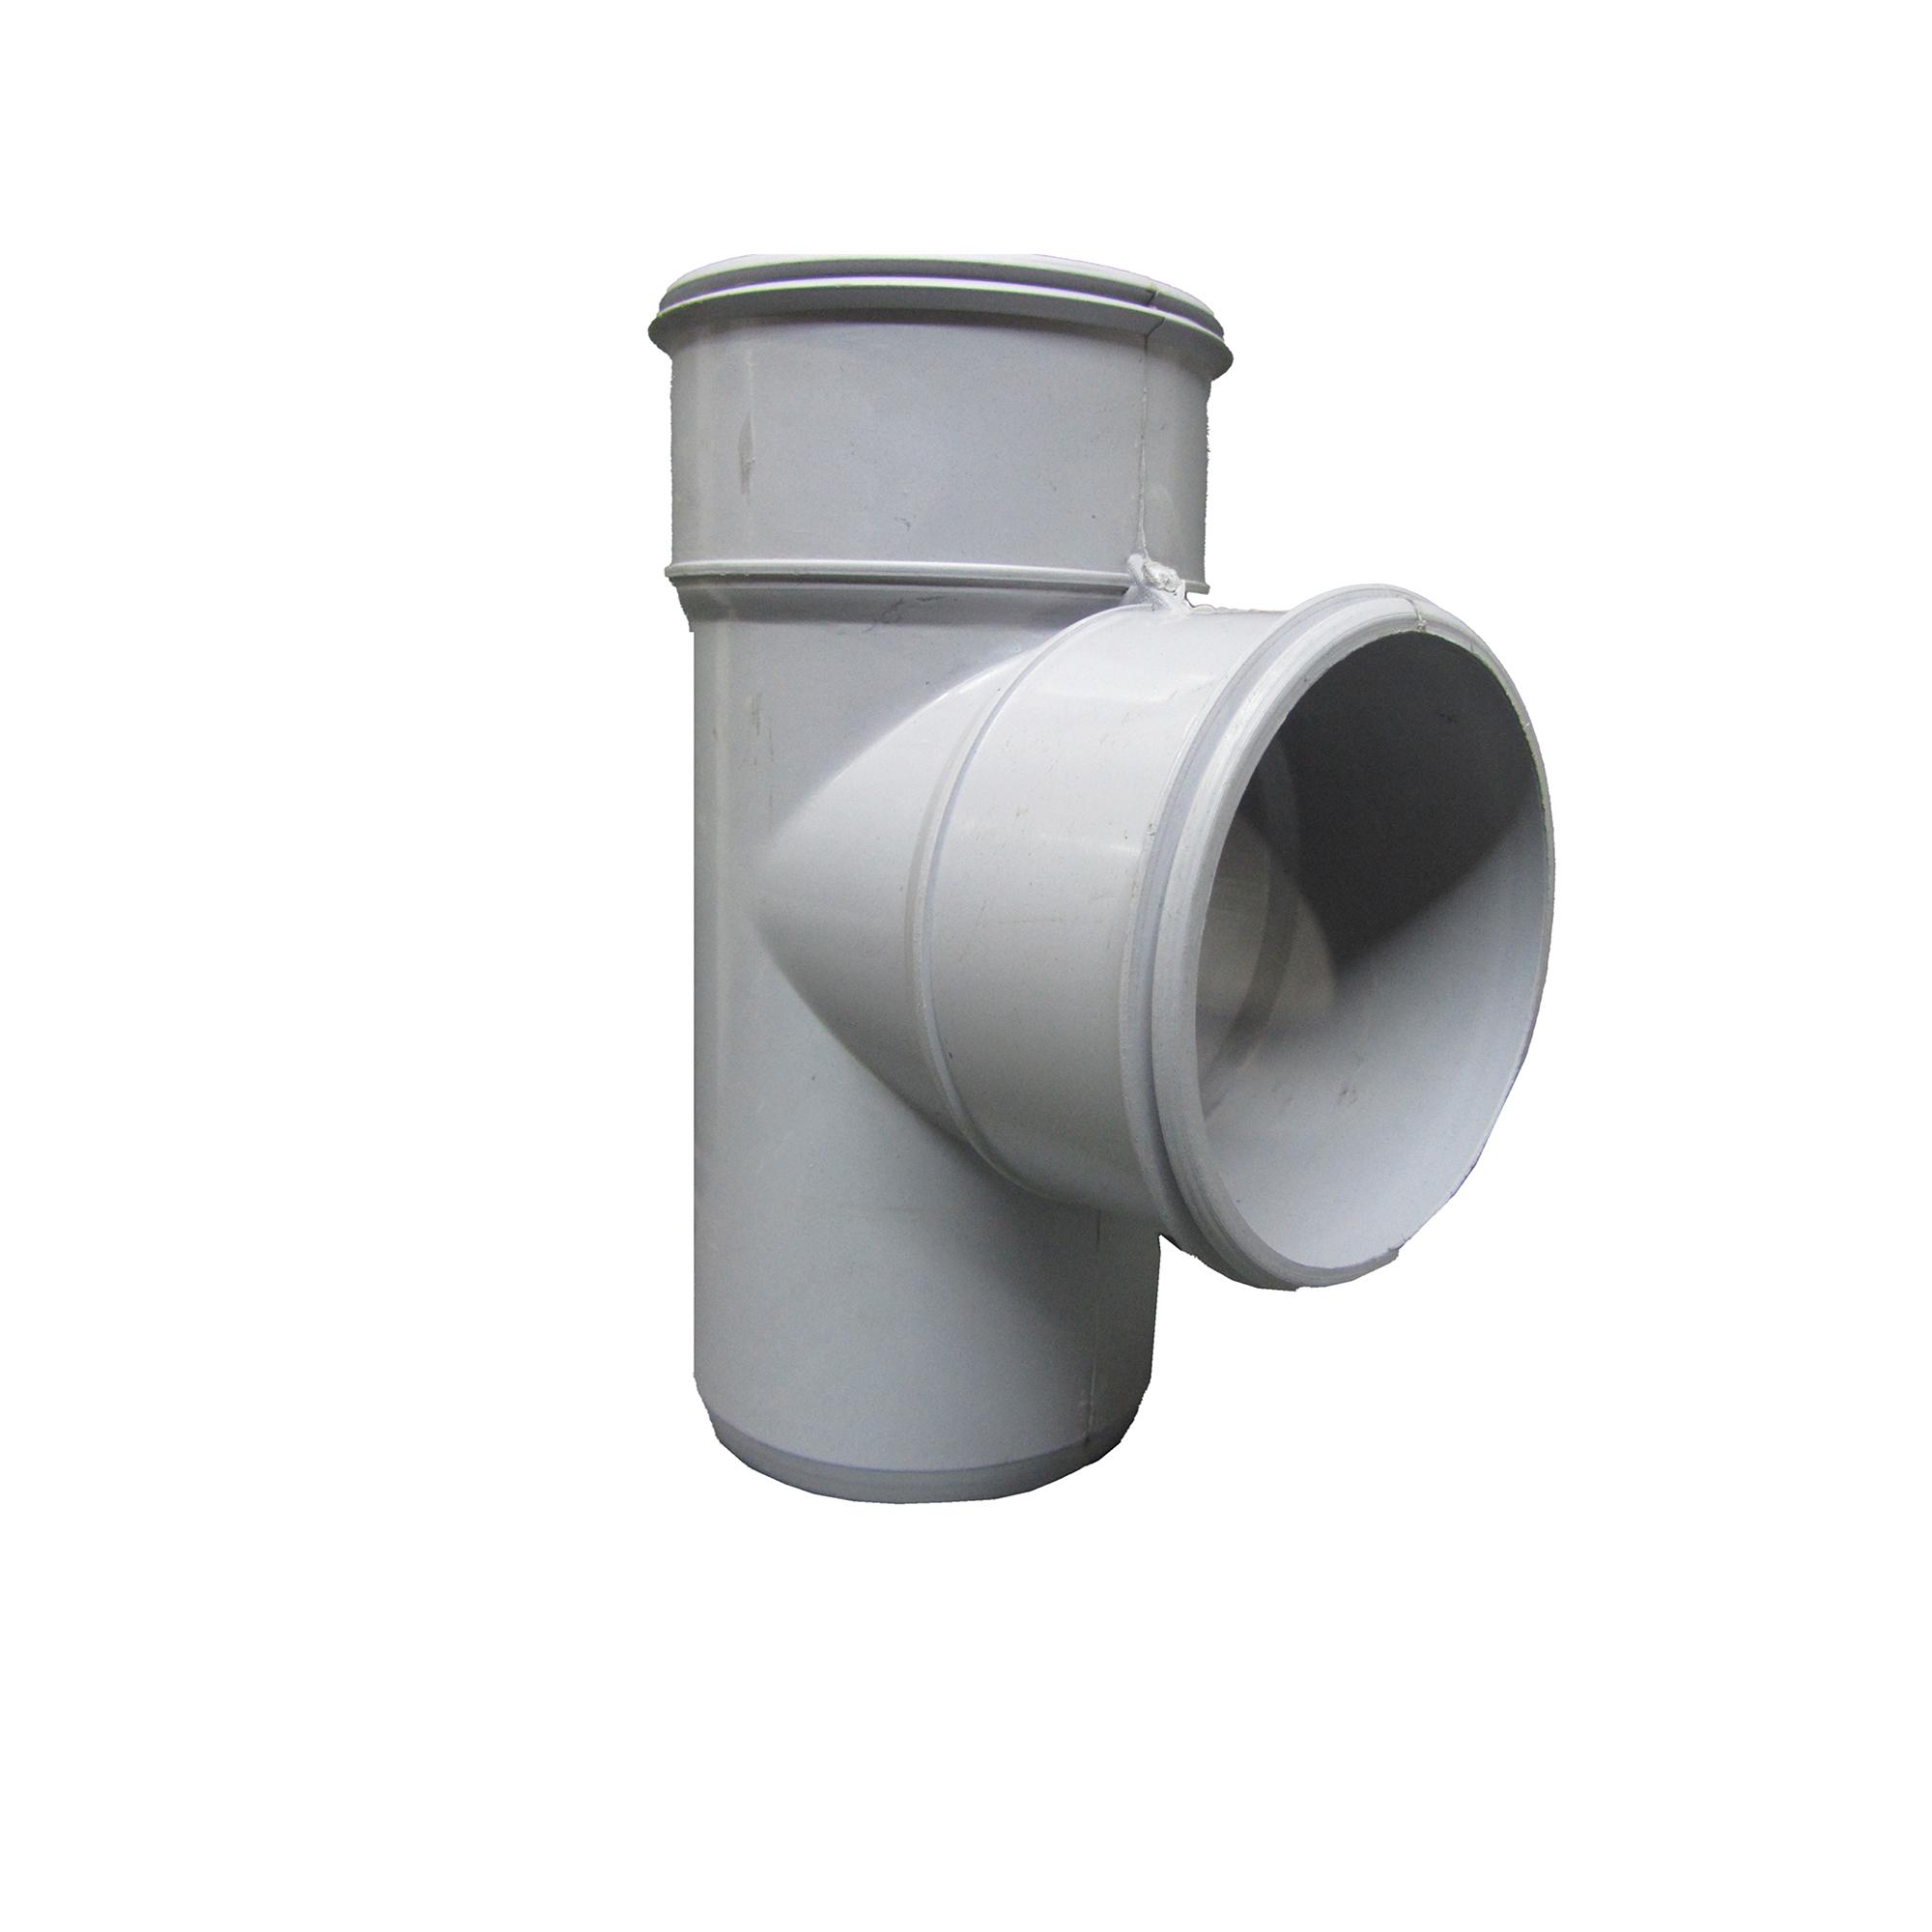 قیمت                                      سه راهی صنایع ارس پلیمر کد ۹۰۹۰